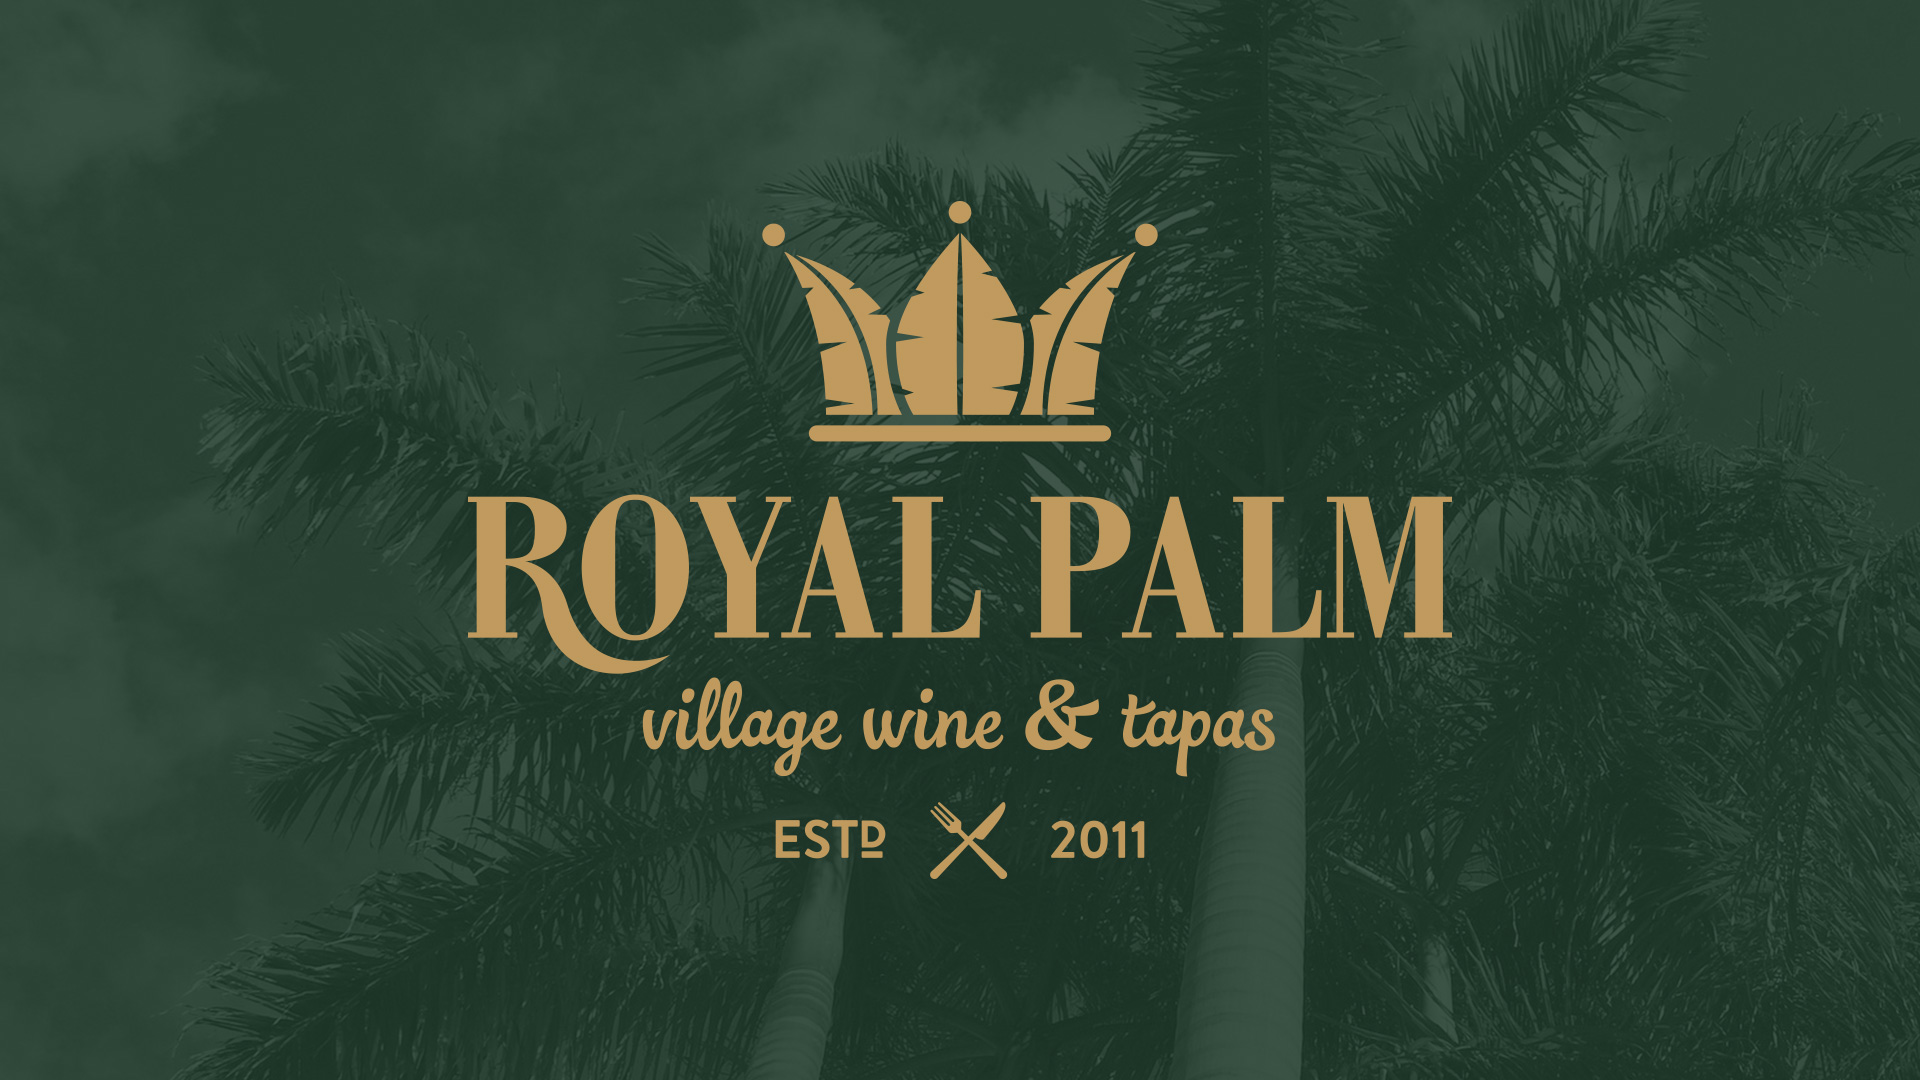 royalpalm_1920x1080-logo.jpg